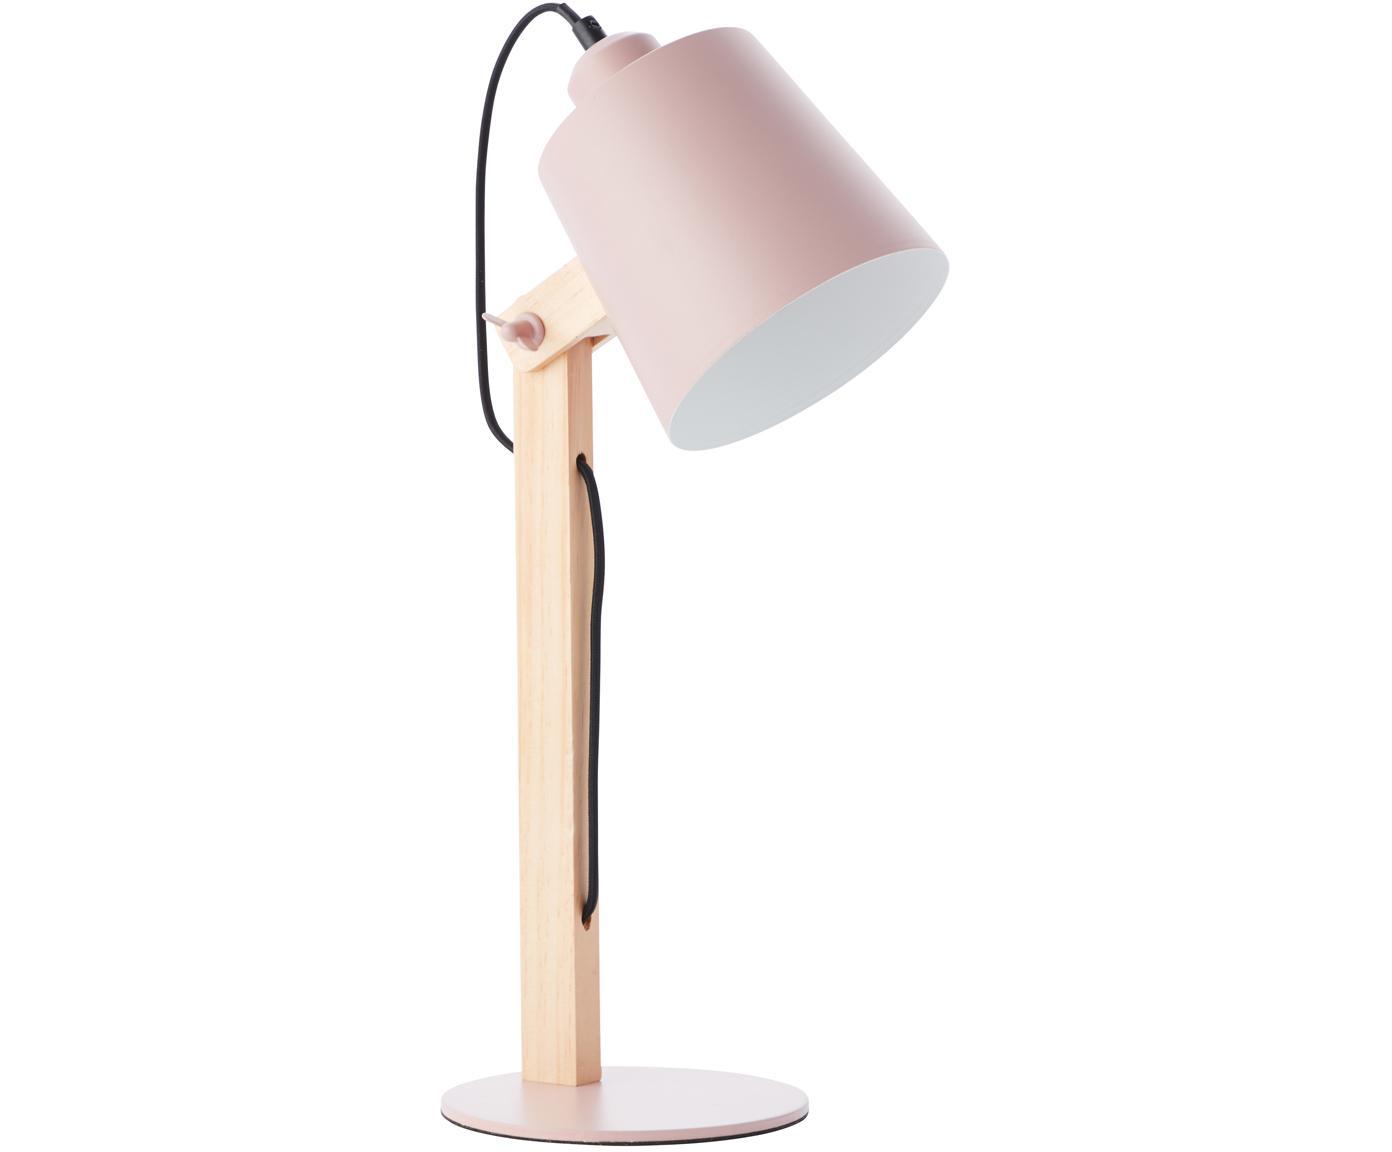 Lámpara de escritorio Swivel, Pantalla: metal, Cable: cubierto en tela, Rosa, madera, An 16 x Al 52 cm